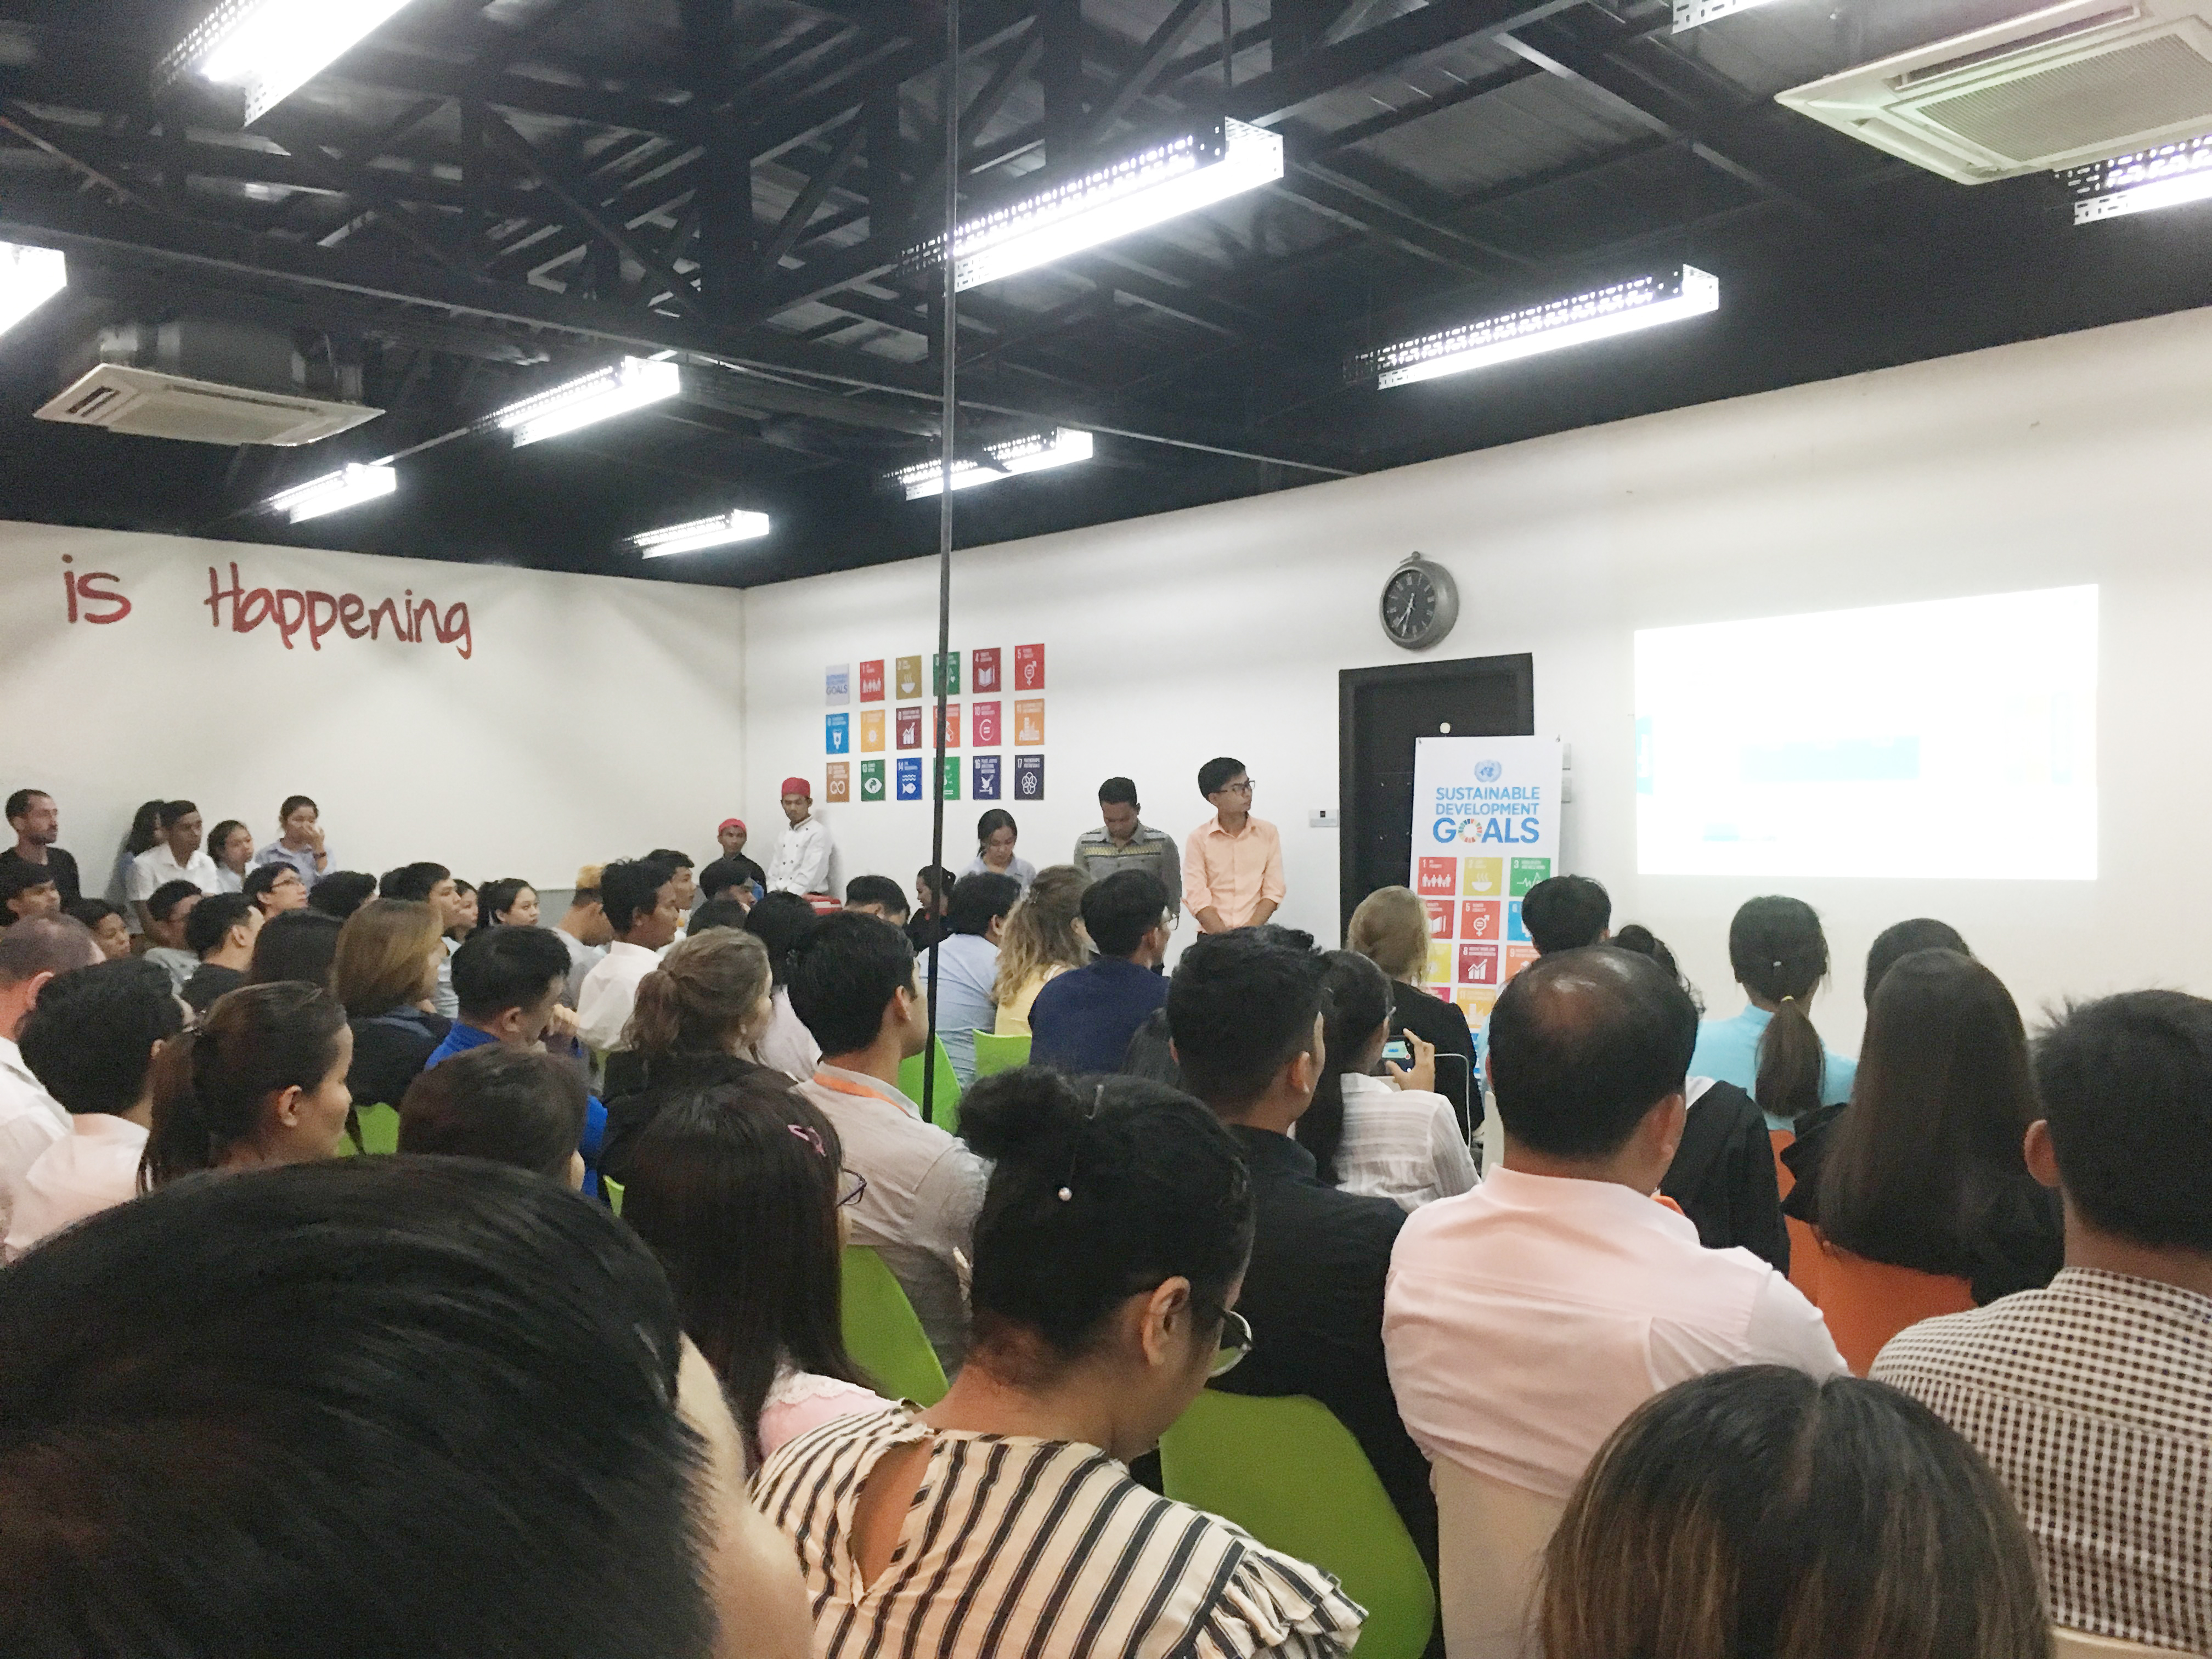 IMPACT HUB Phnom Penhで開催された、SDGsに関係する事業アイデアのピッチコンテスト。